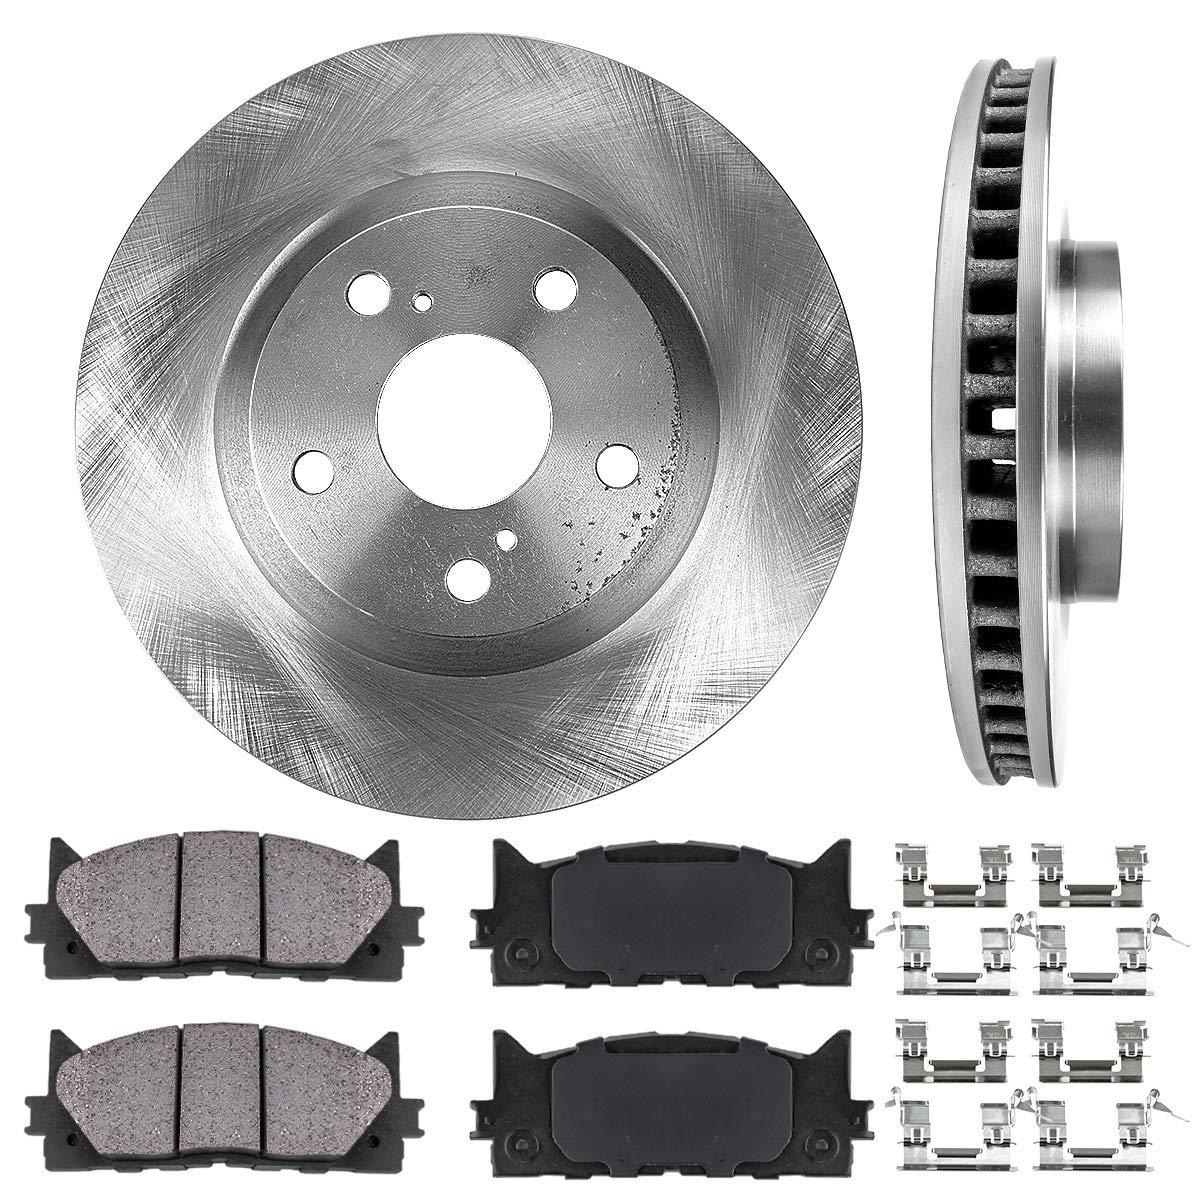 FRONT 296 mm Premium OE 5 Lug [2] Brake Disc Rotors + [4] Ceramic Brake Pads + Hardware Callahan Brake Parts